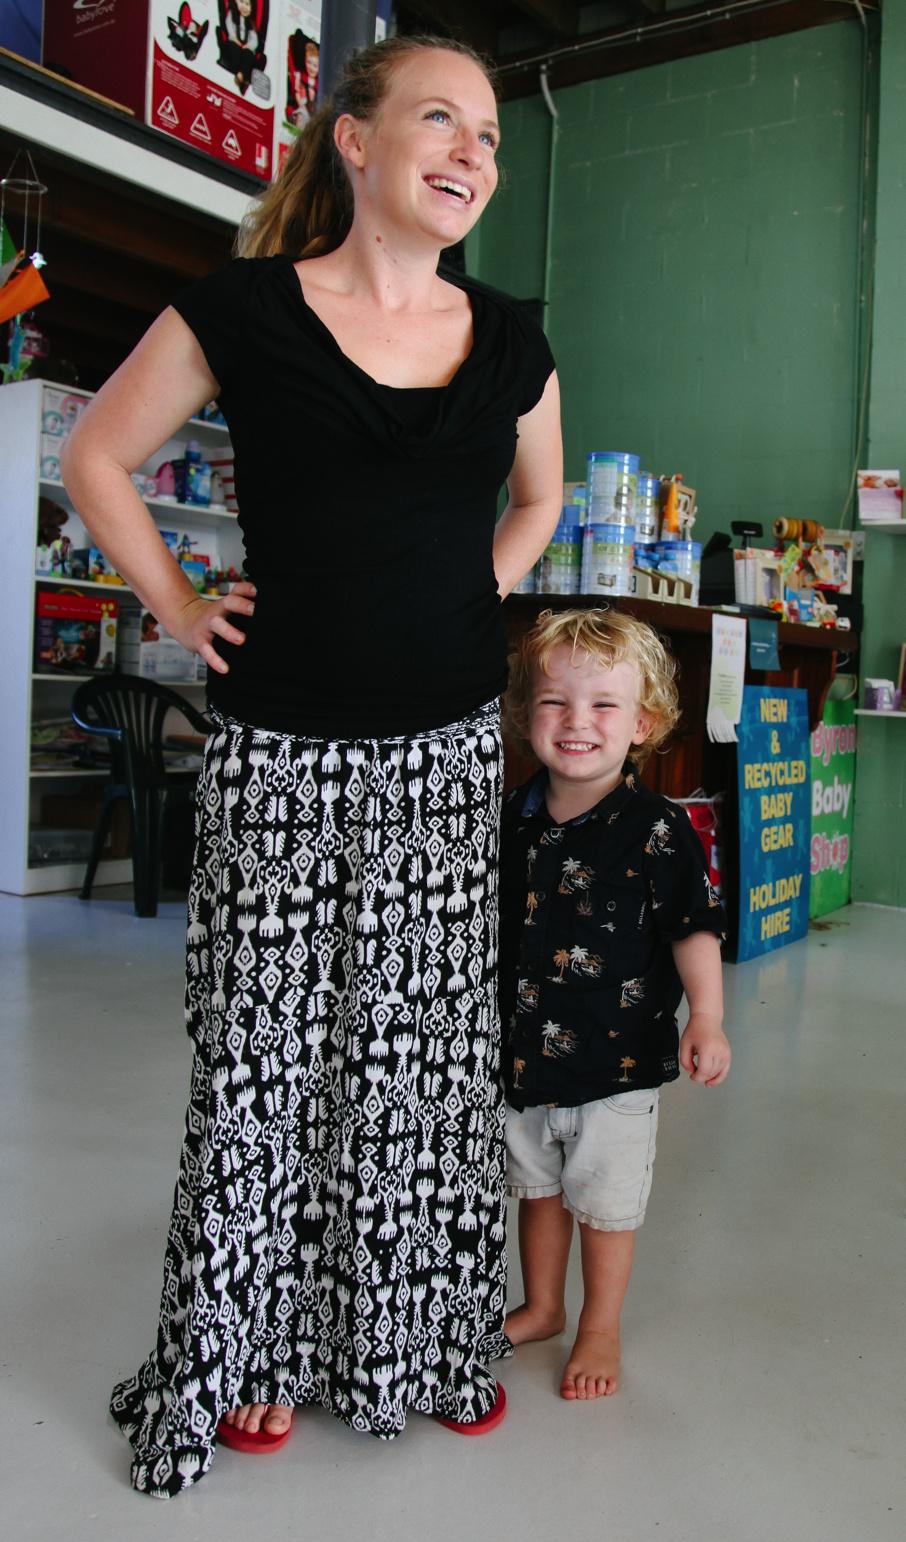 Baby store photos-4.jpg